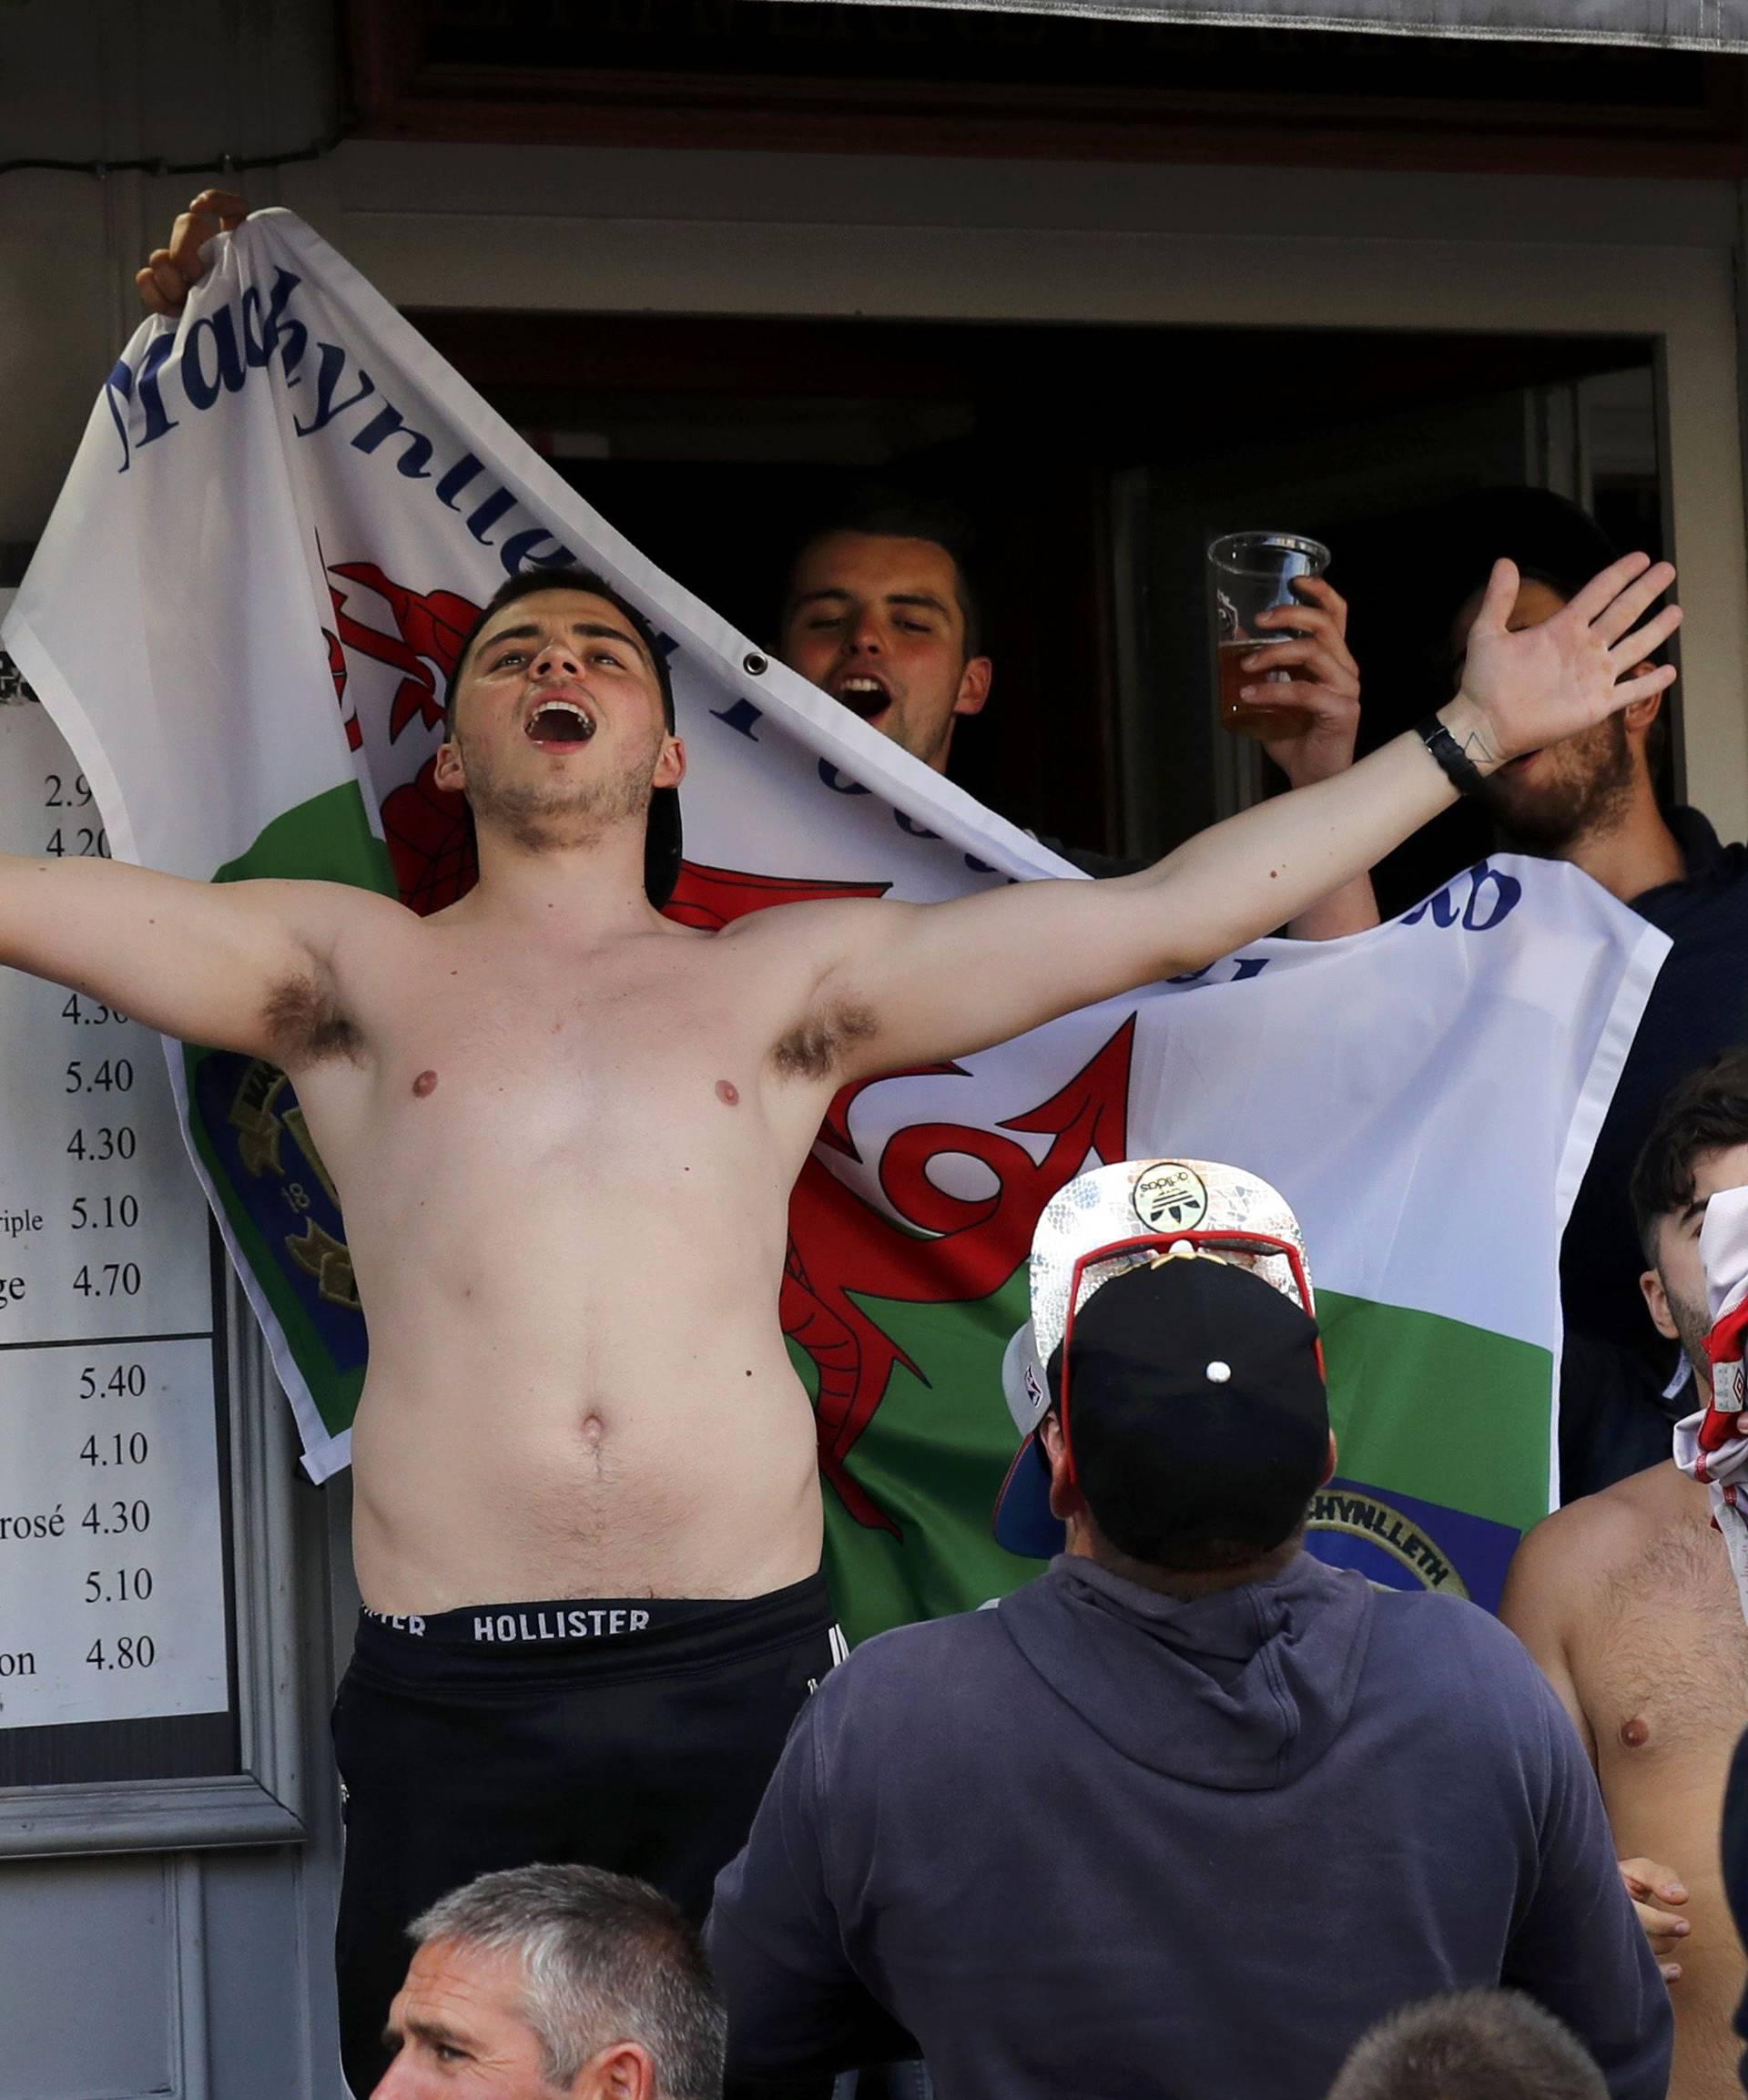 Euro 2016 - Fans